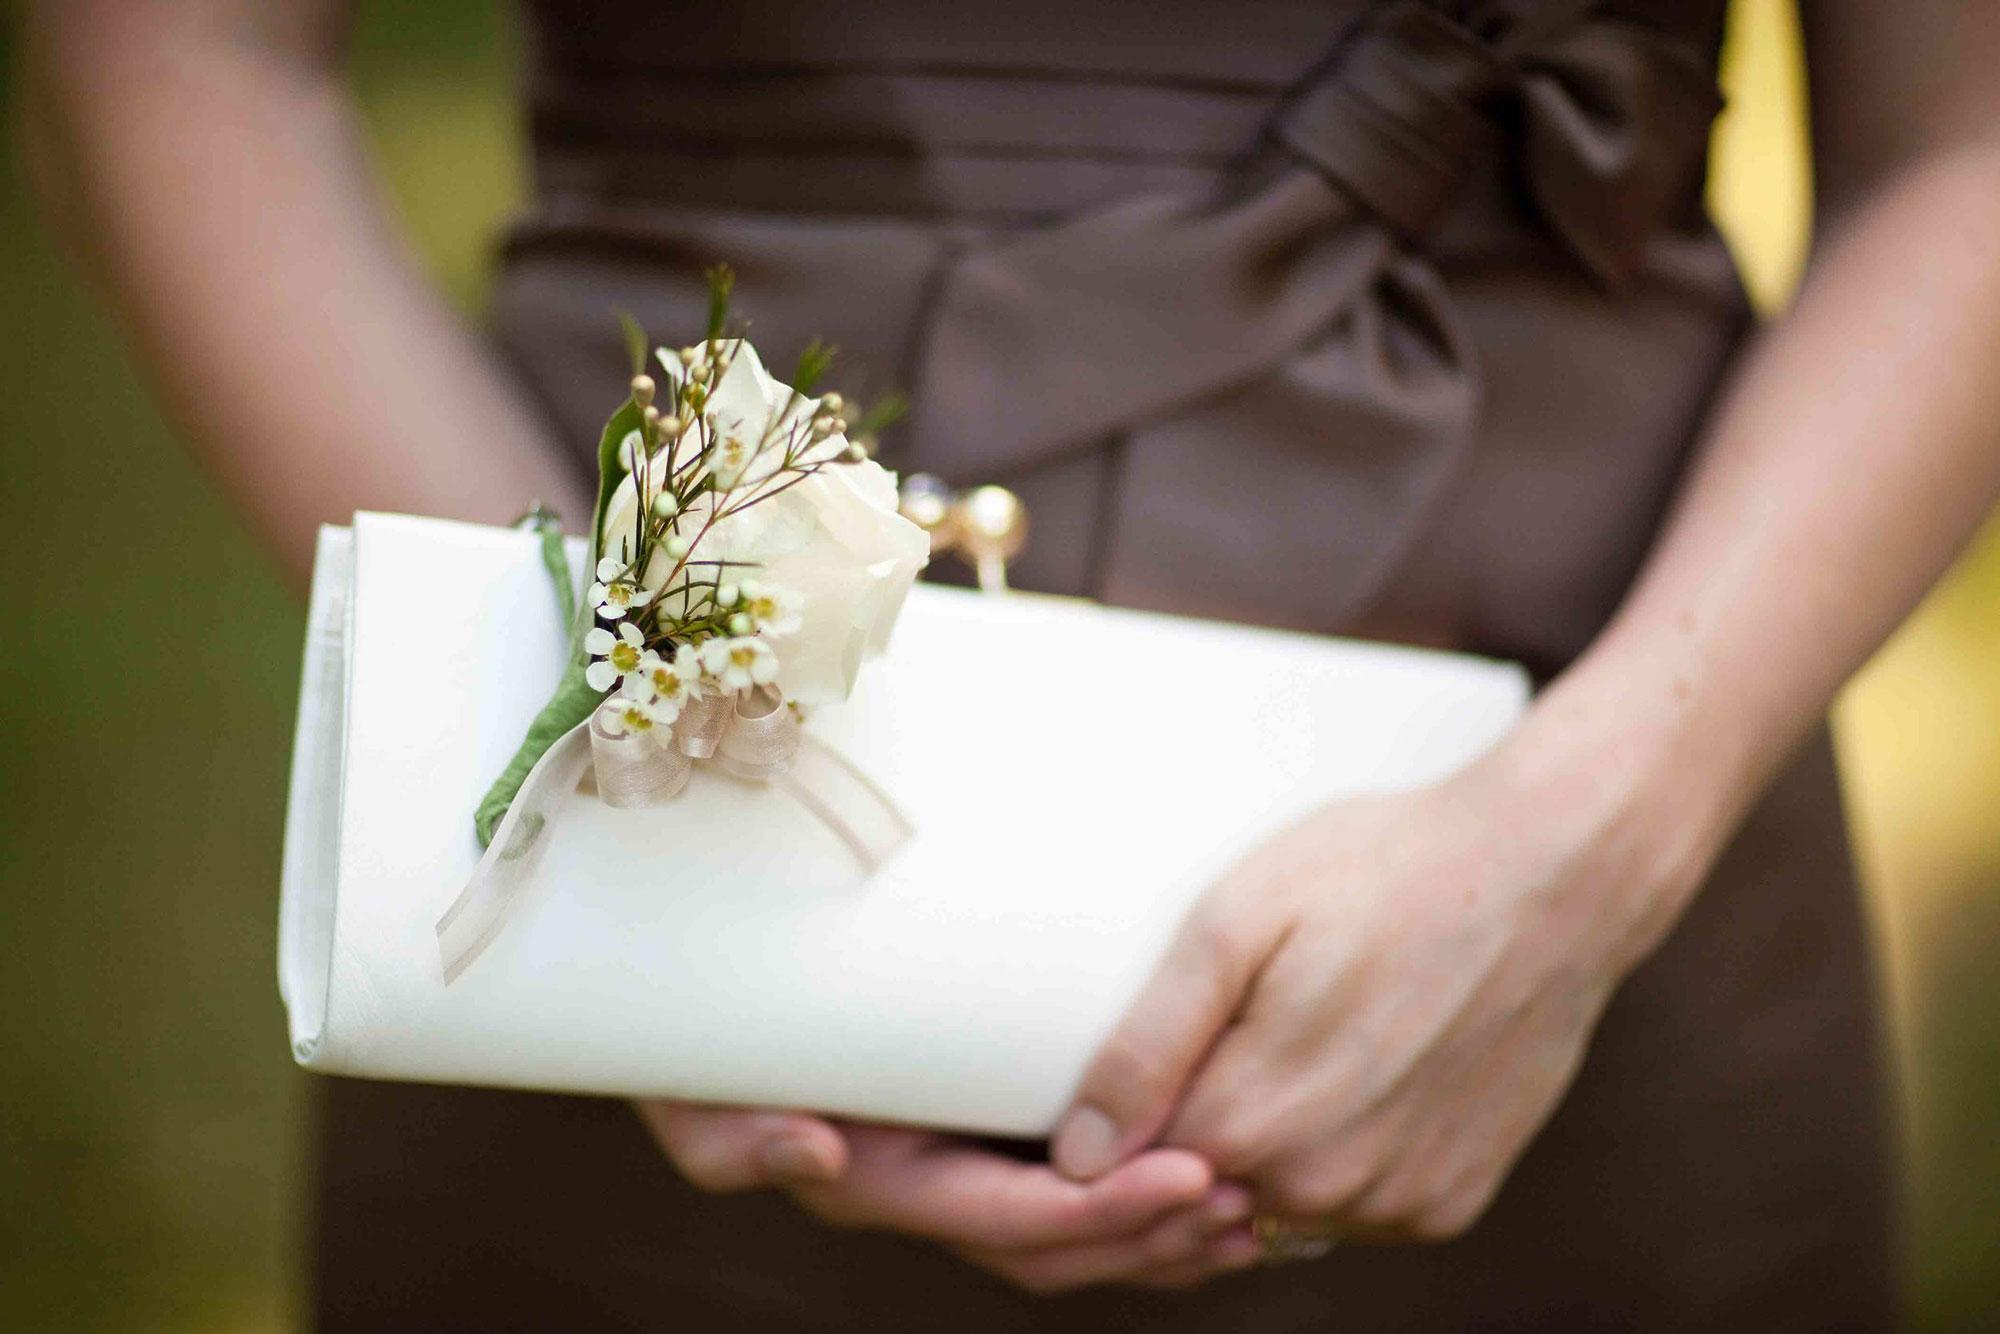 Amanda-Cowley-Willowbank-Vineyard-Bride-Photo-By-White-Photographie-018.jpg